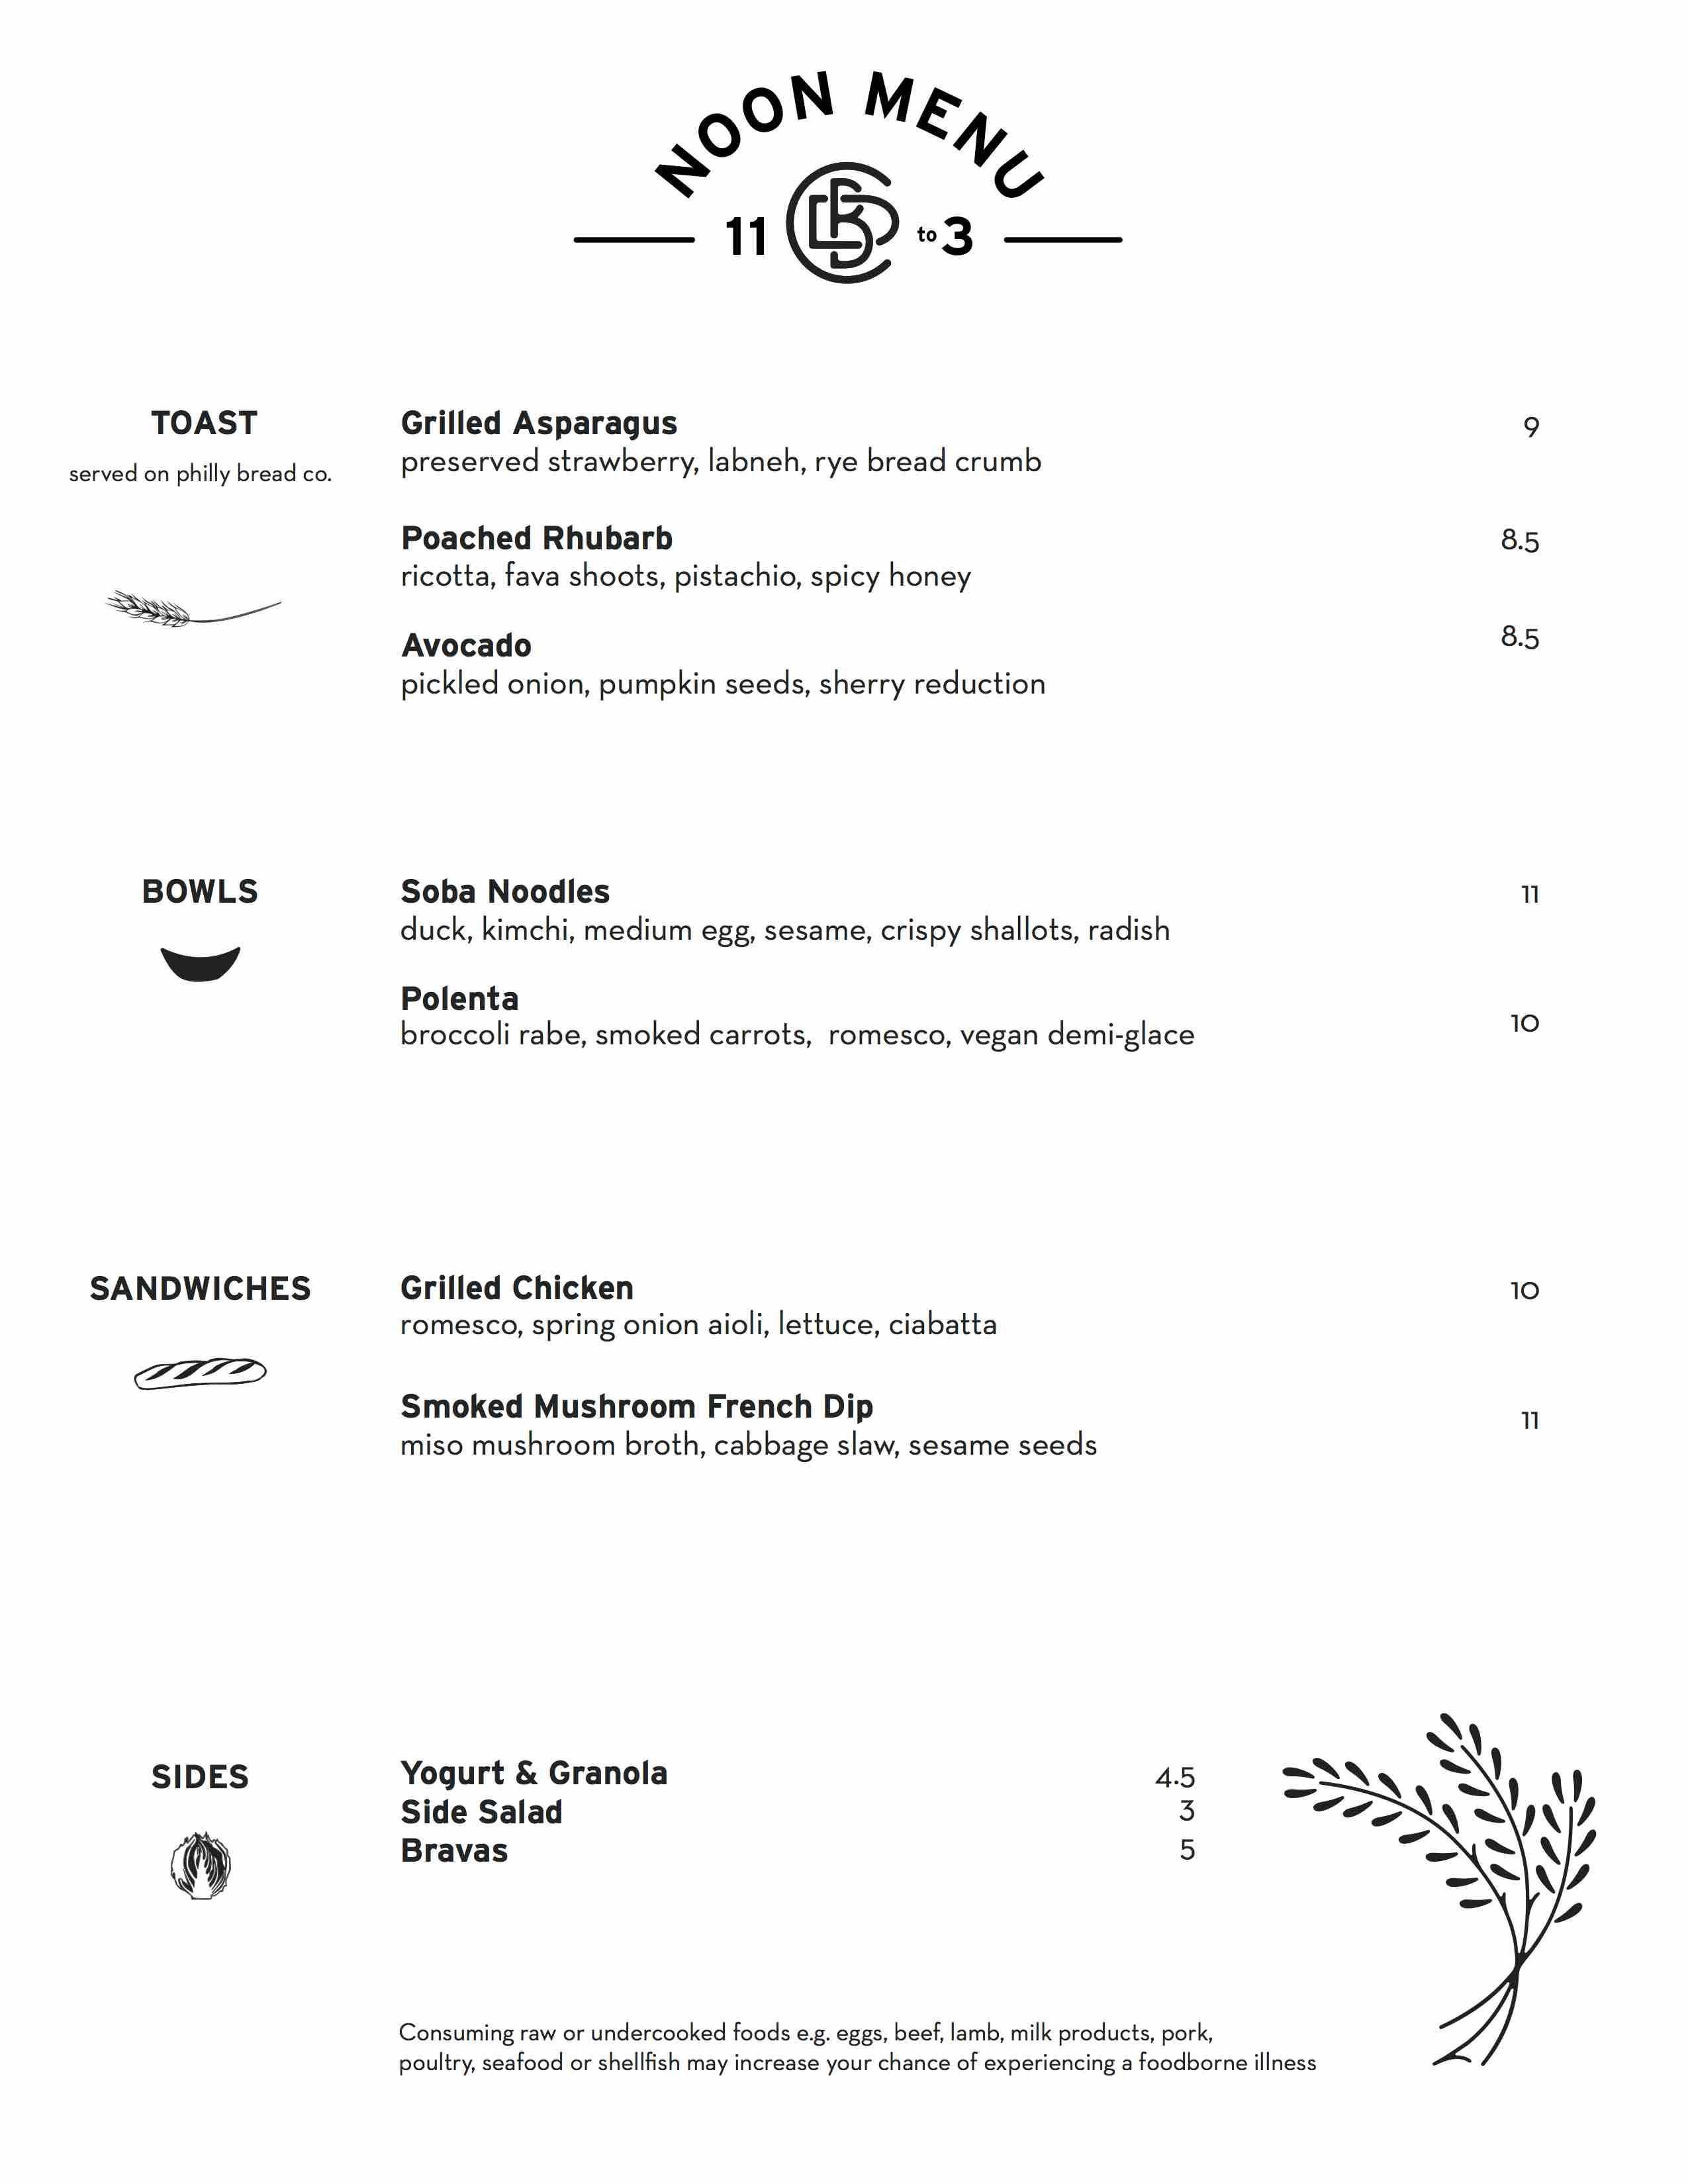 bloomsday lunch menu philadelphia